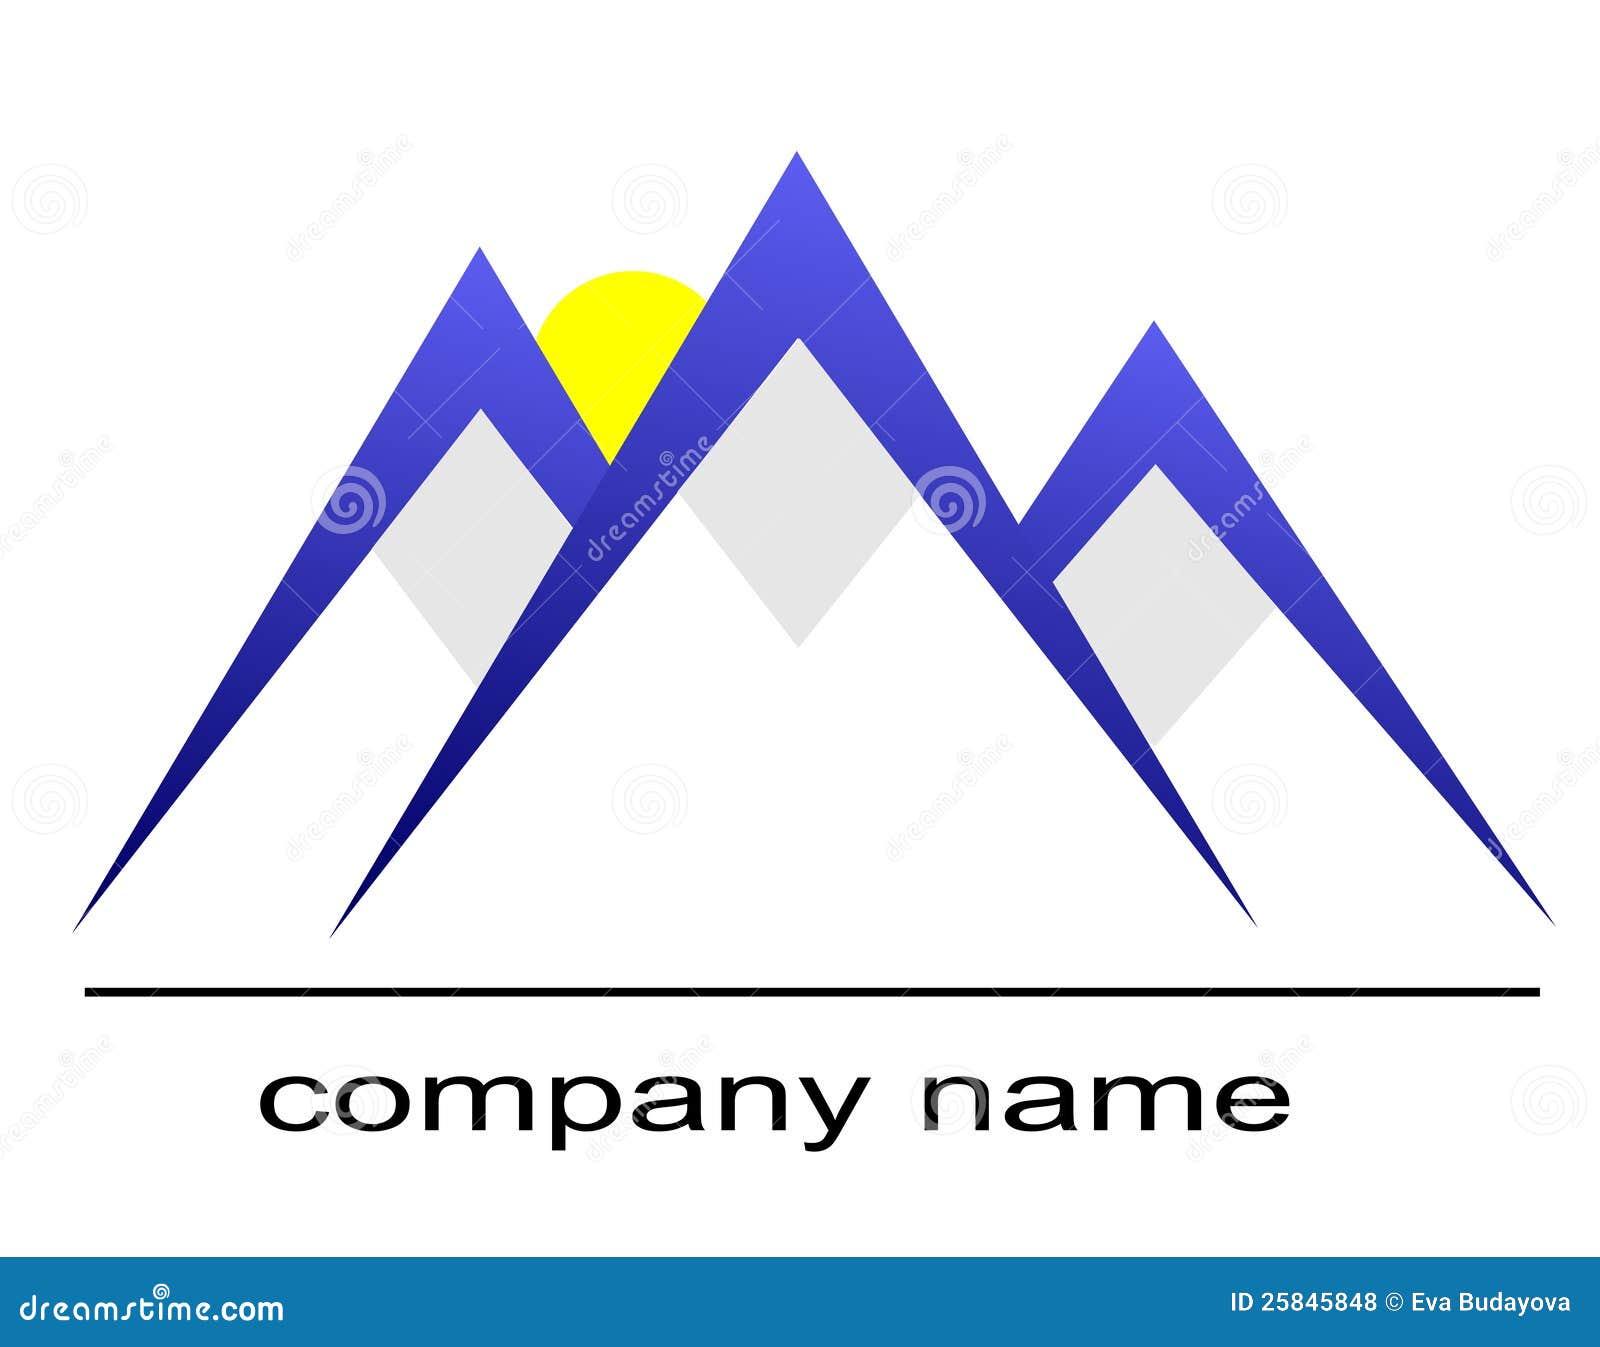 Parameter Reporting Limit FDA SOQ / EPA MCL Ice Mountain® Spring Water Ice Mountain® Drinking Water Ice Mountain® Drinking Water with Minerals.